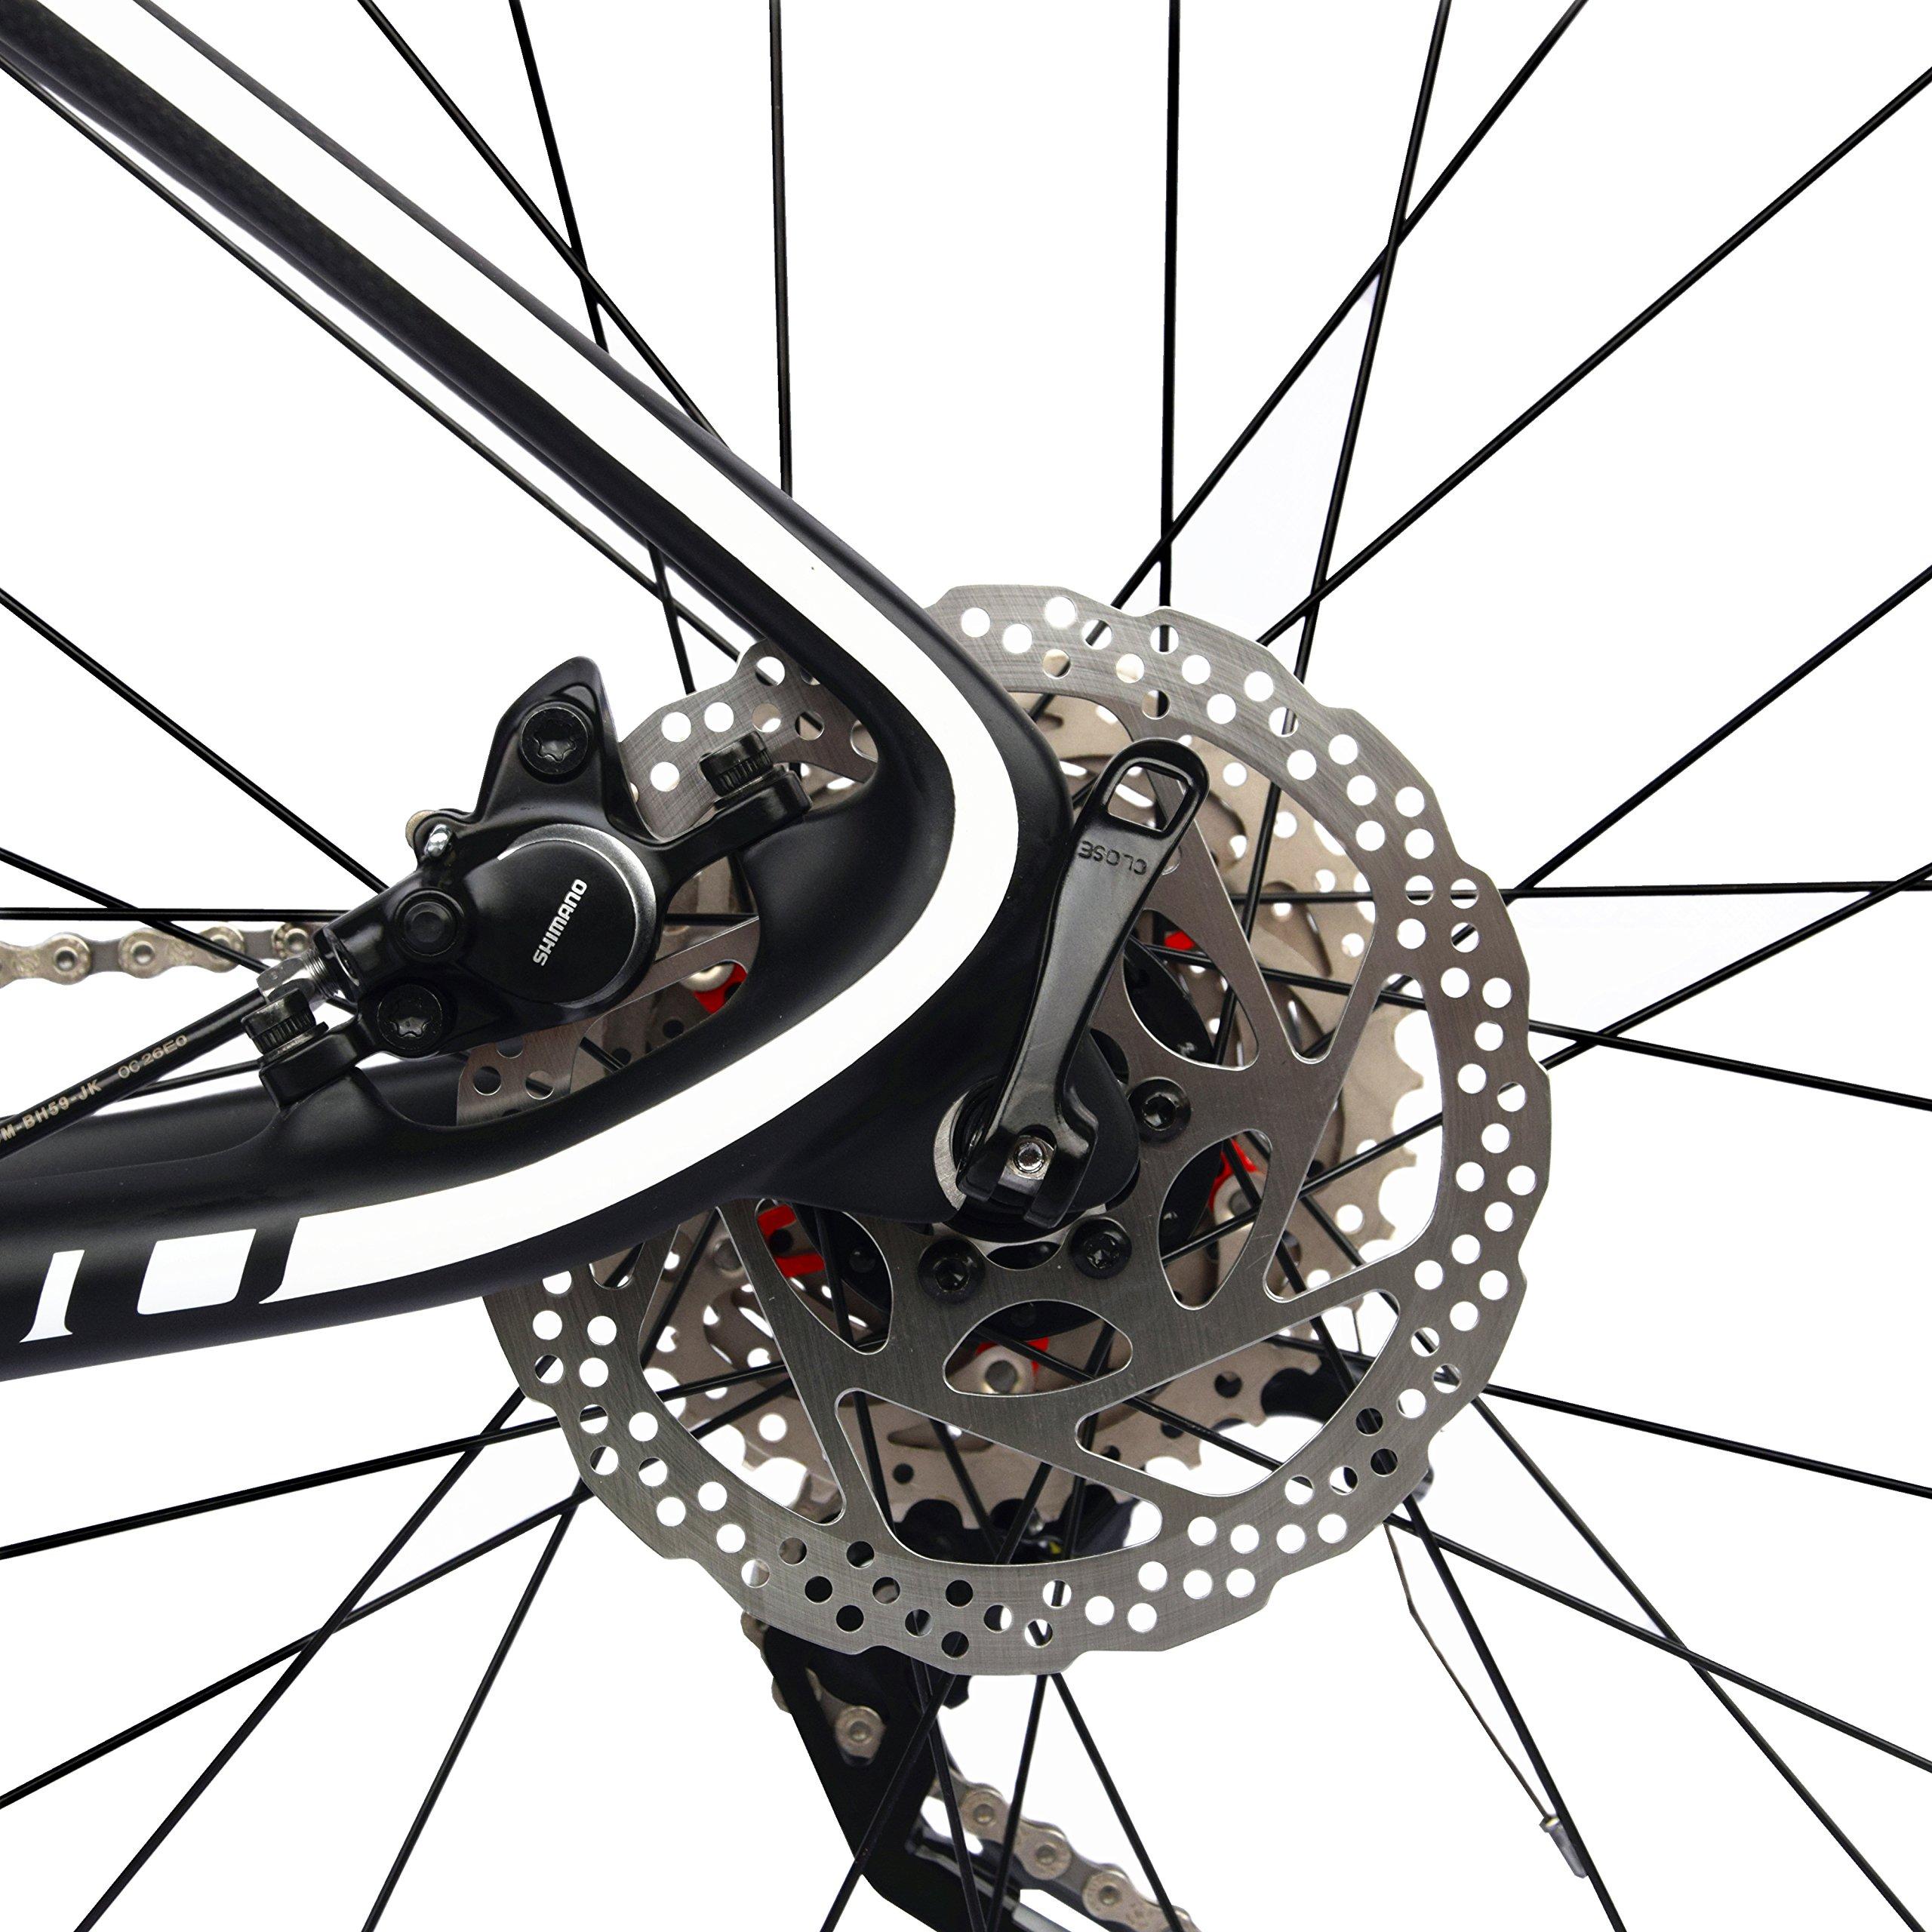 Beiou Carbon Fiber Mountain Bike Review 4